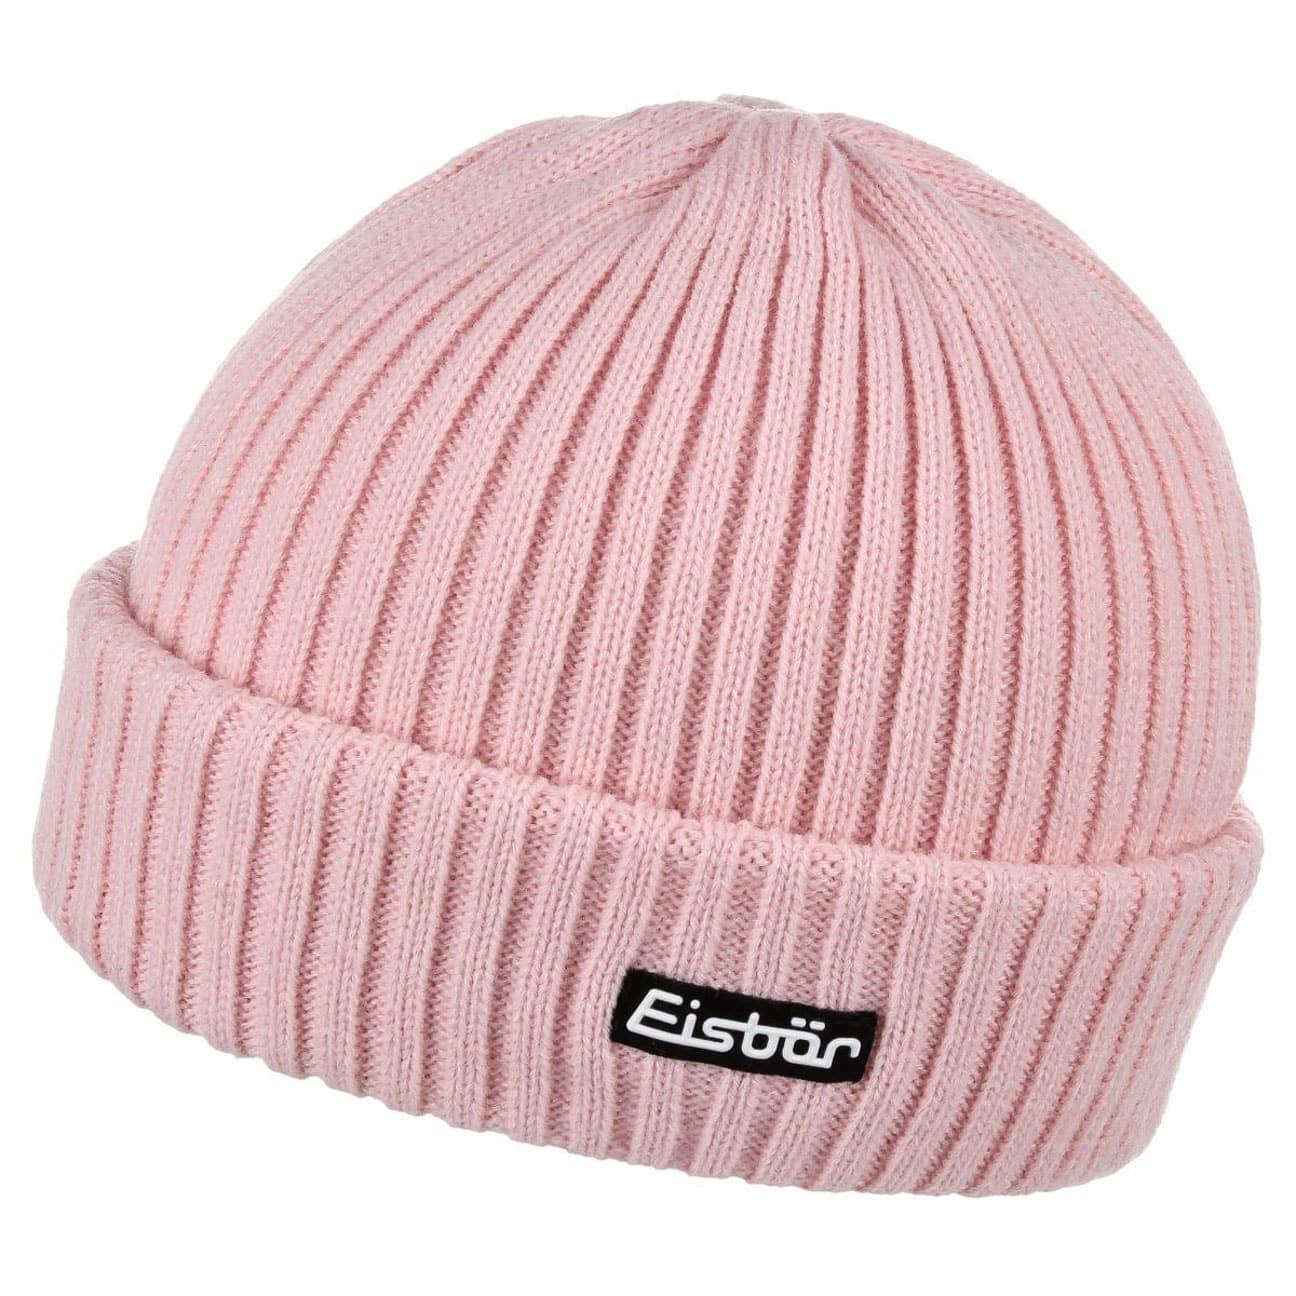 Bonnet à Revers Ripp by Eisbär  bonnet beanie